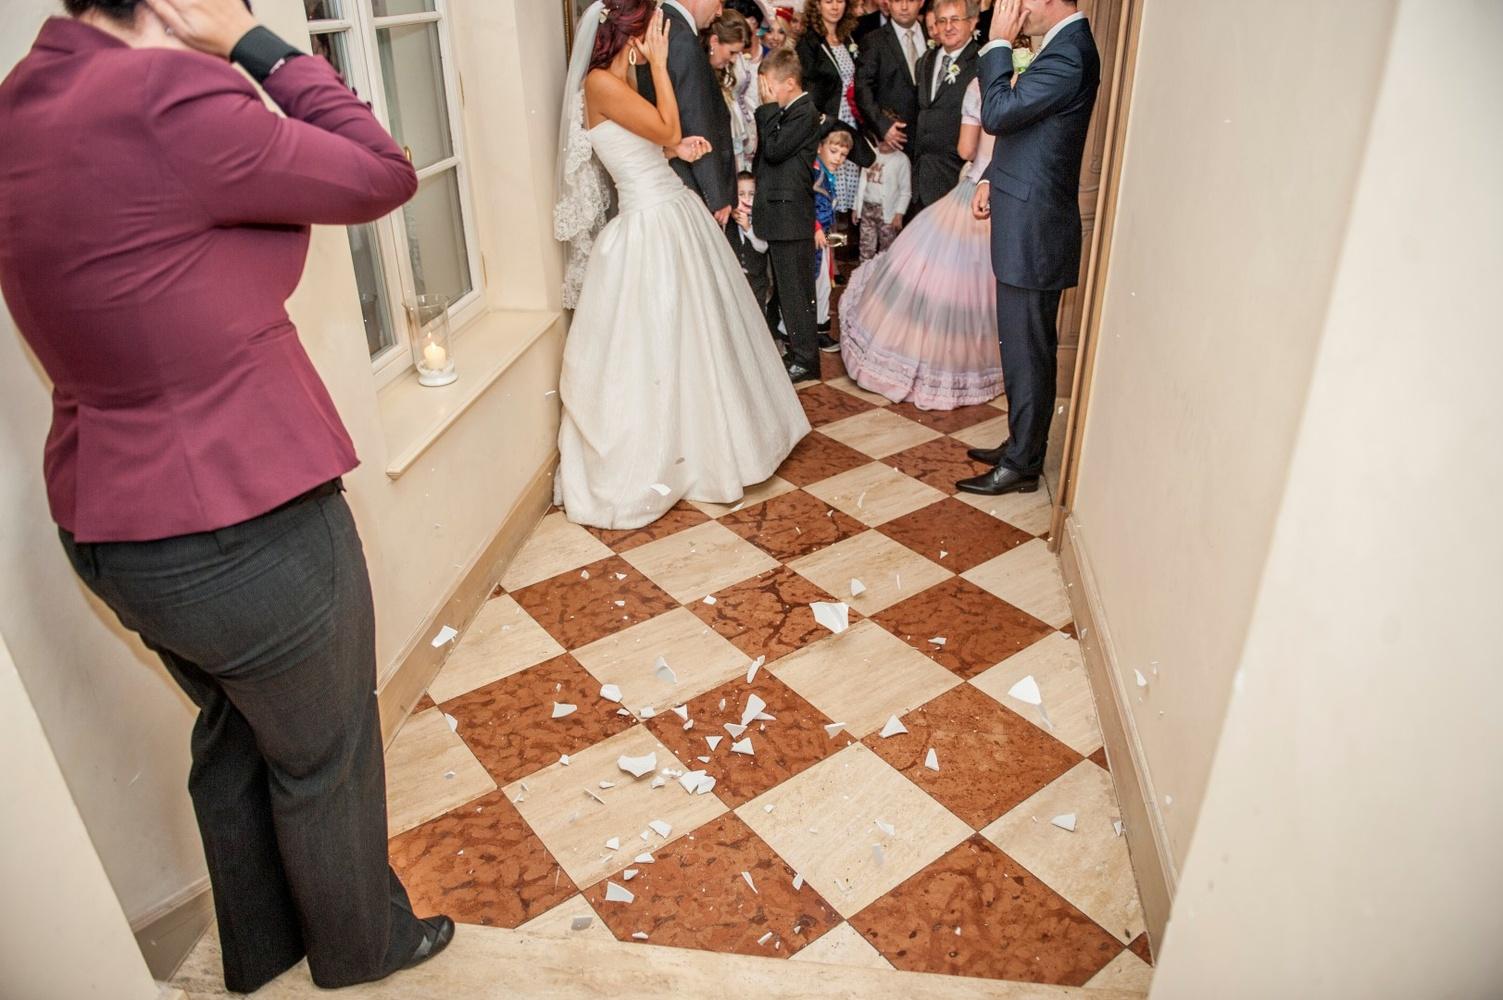 http://www.fotoz.sk/images/gallery-12/normal/svadba_hotel-chateau-bela_142.jpg